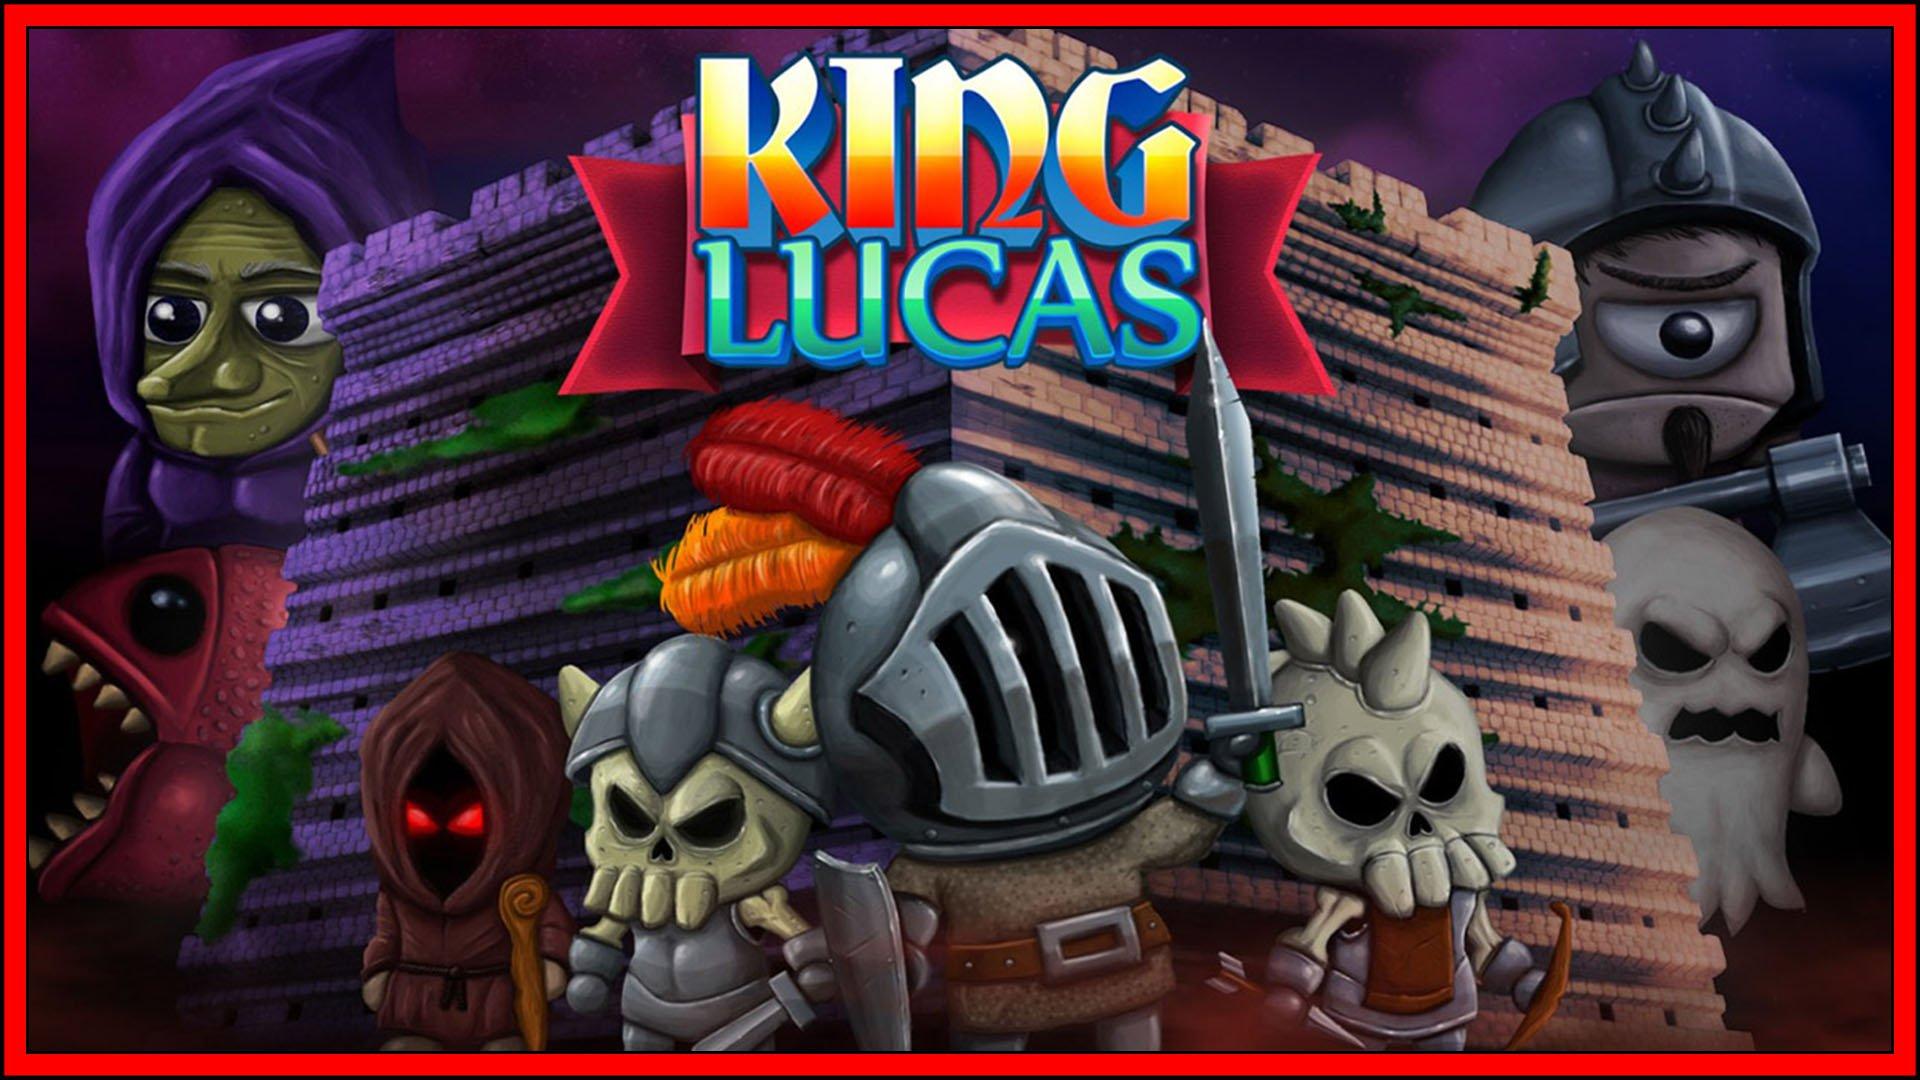 King Lucas Fi3